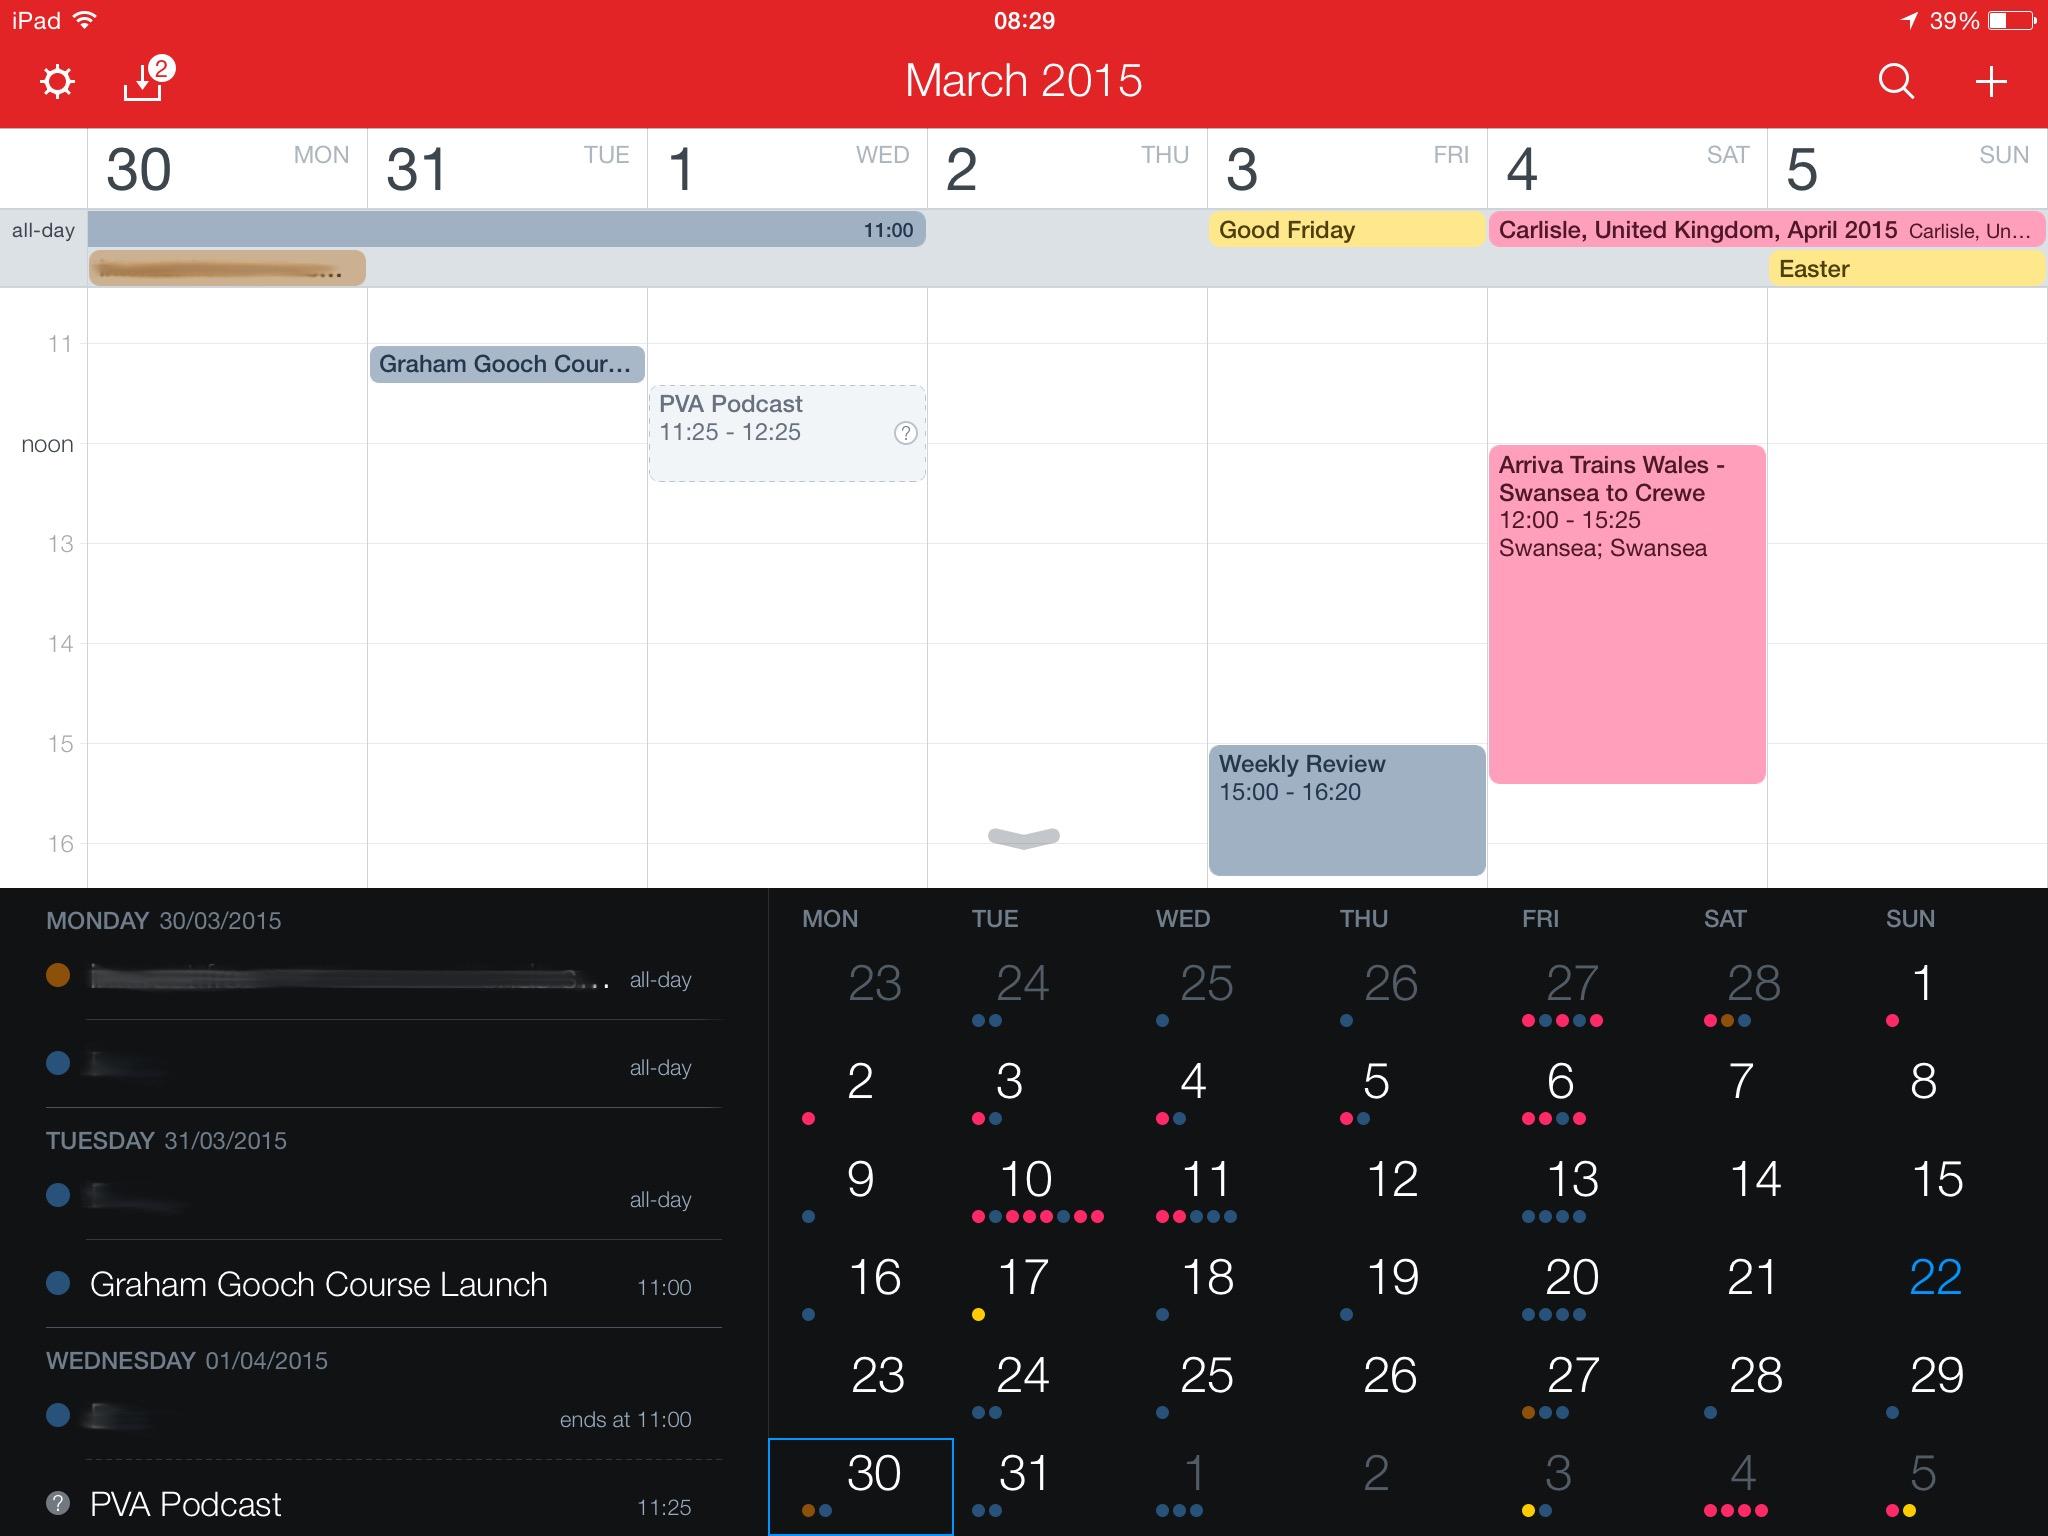 Fantastical on the iPad has awesome calendar entry magic